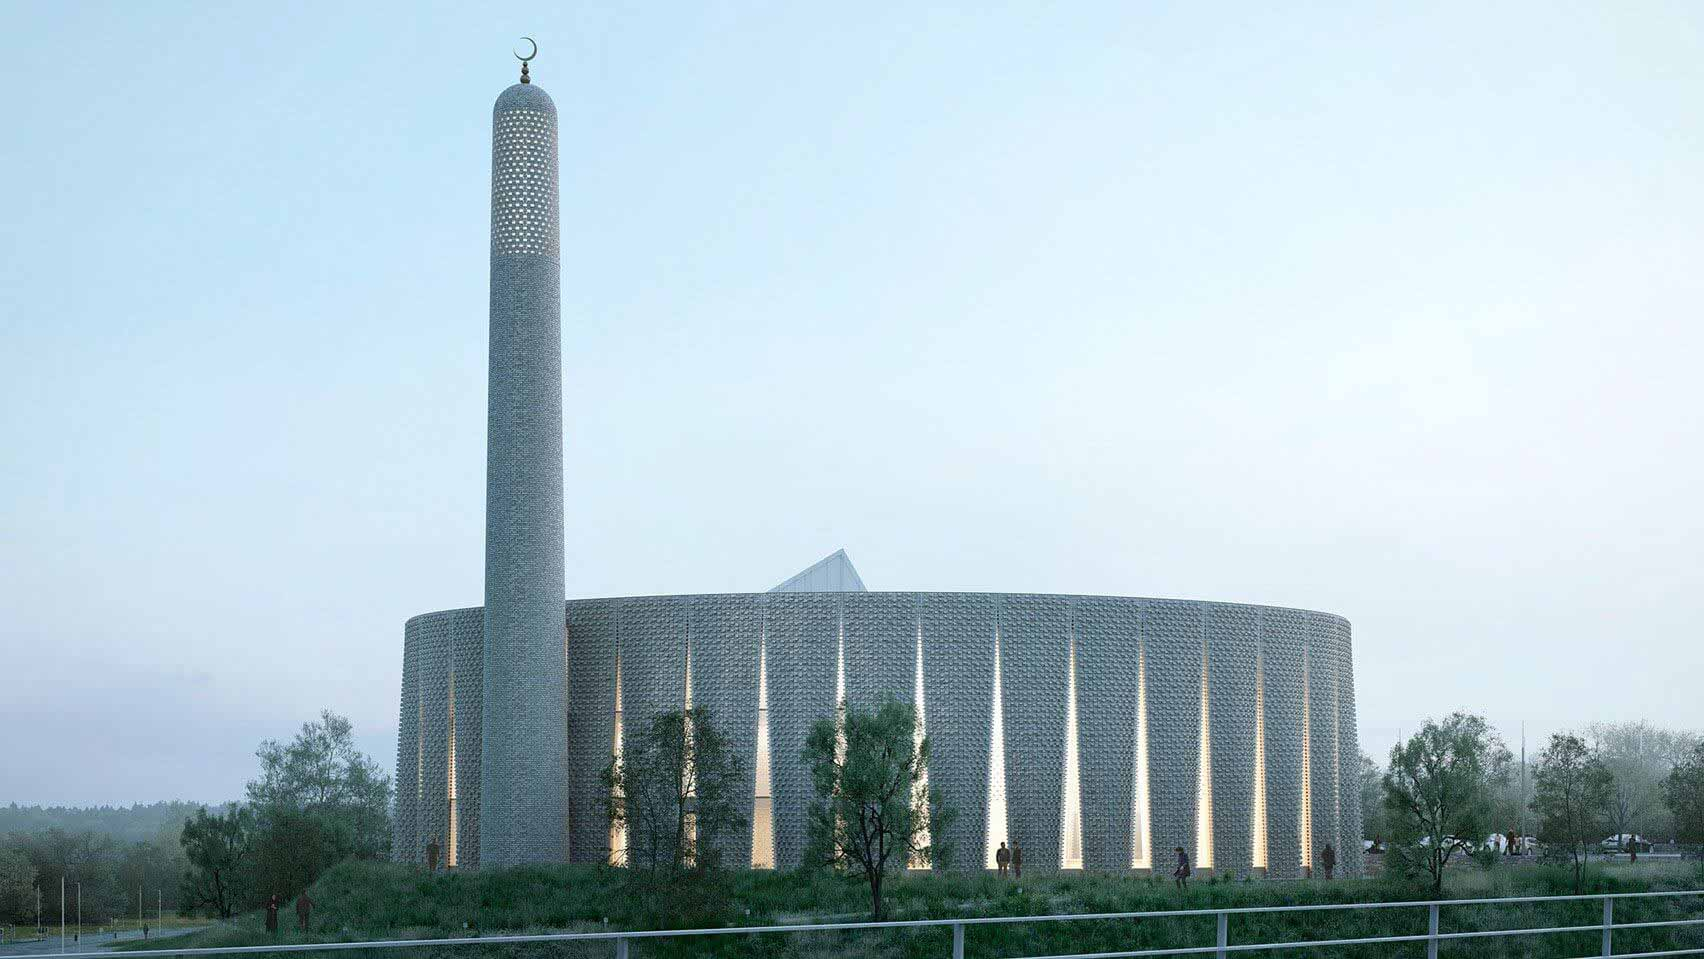 Лука Пойан Формс проектирует мечеть из декоративного кирпича для Престона